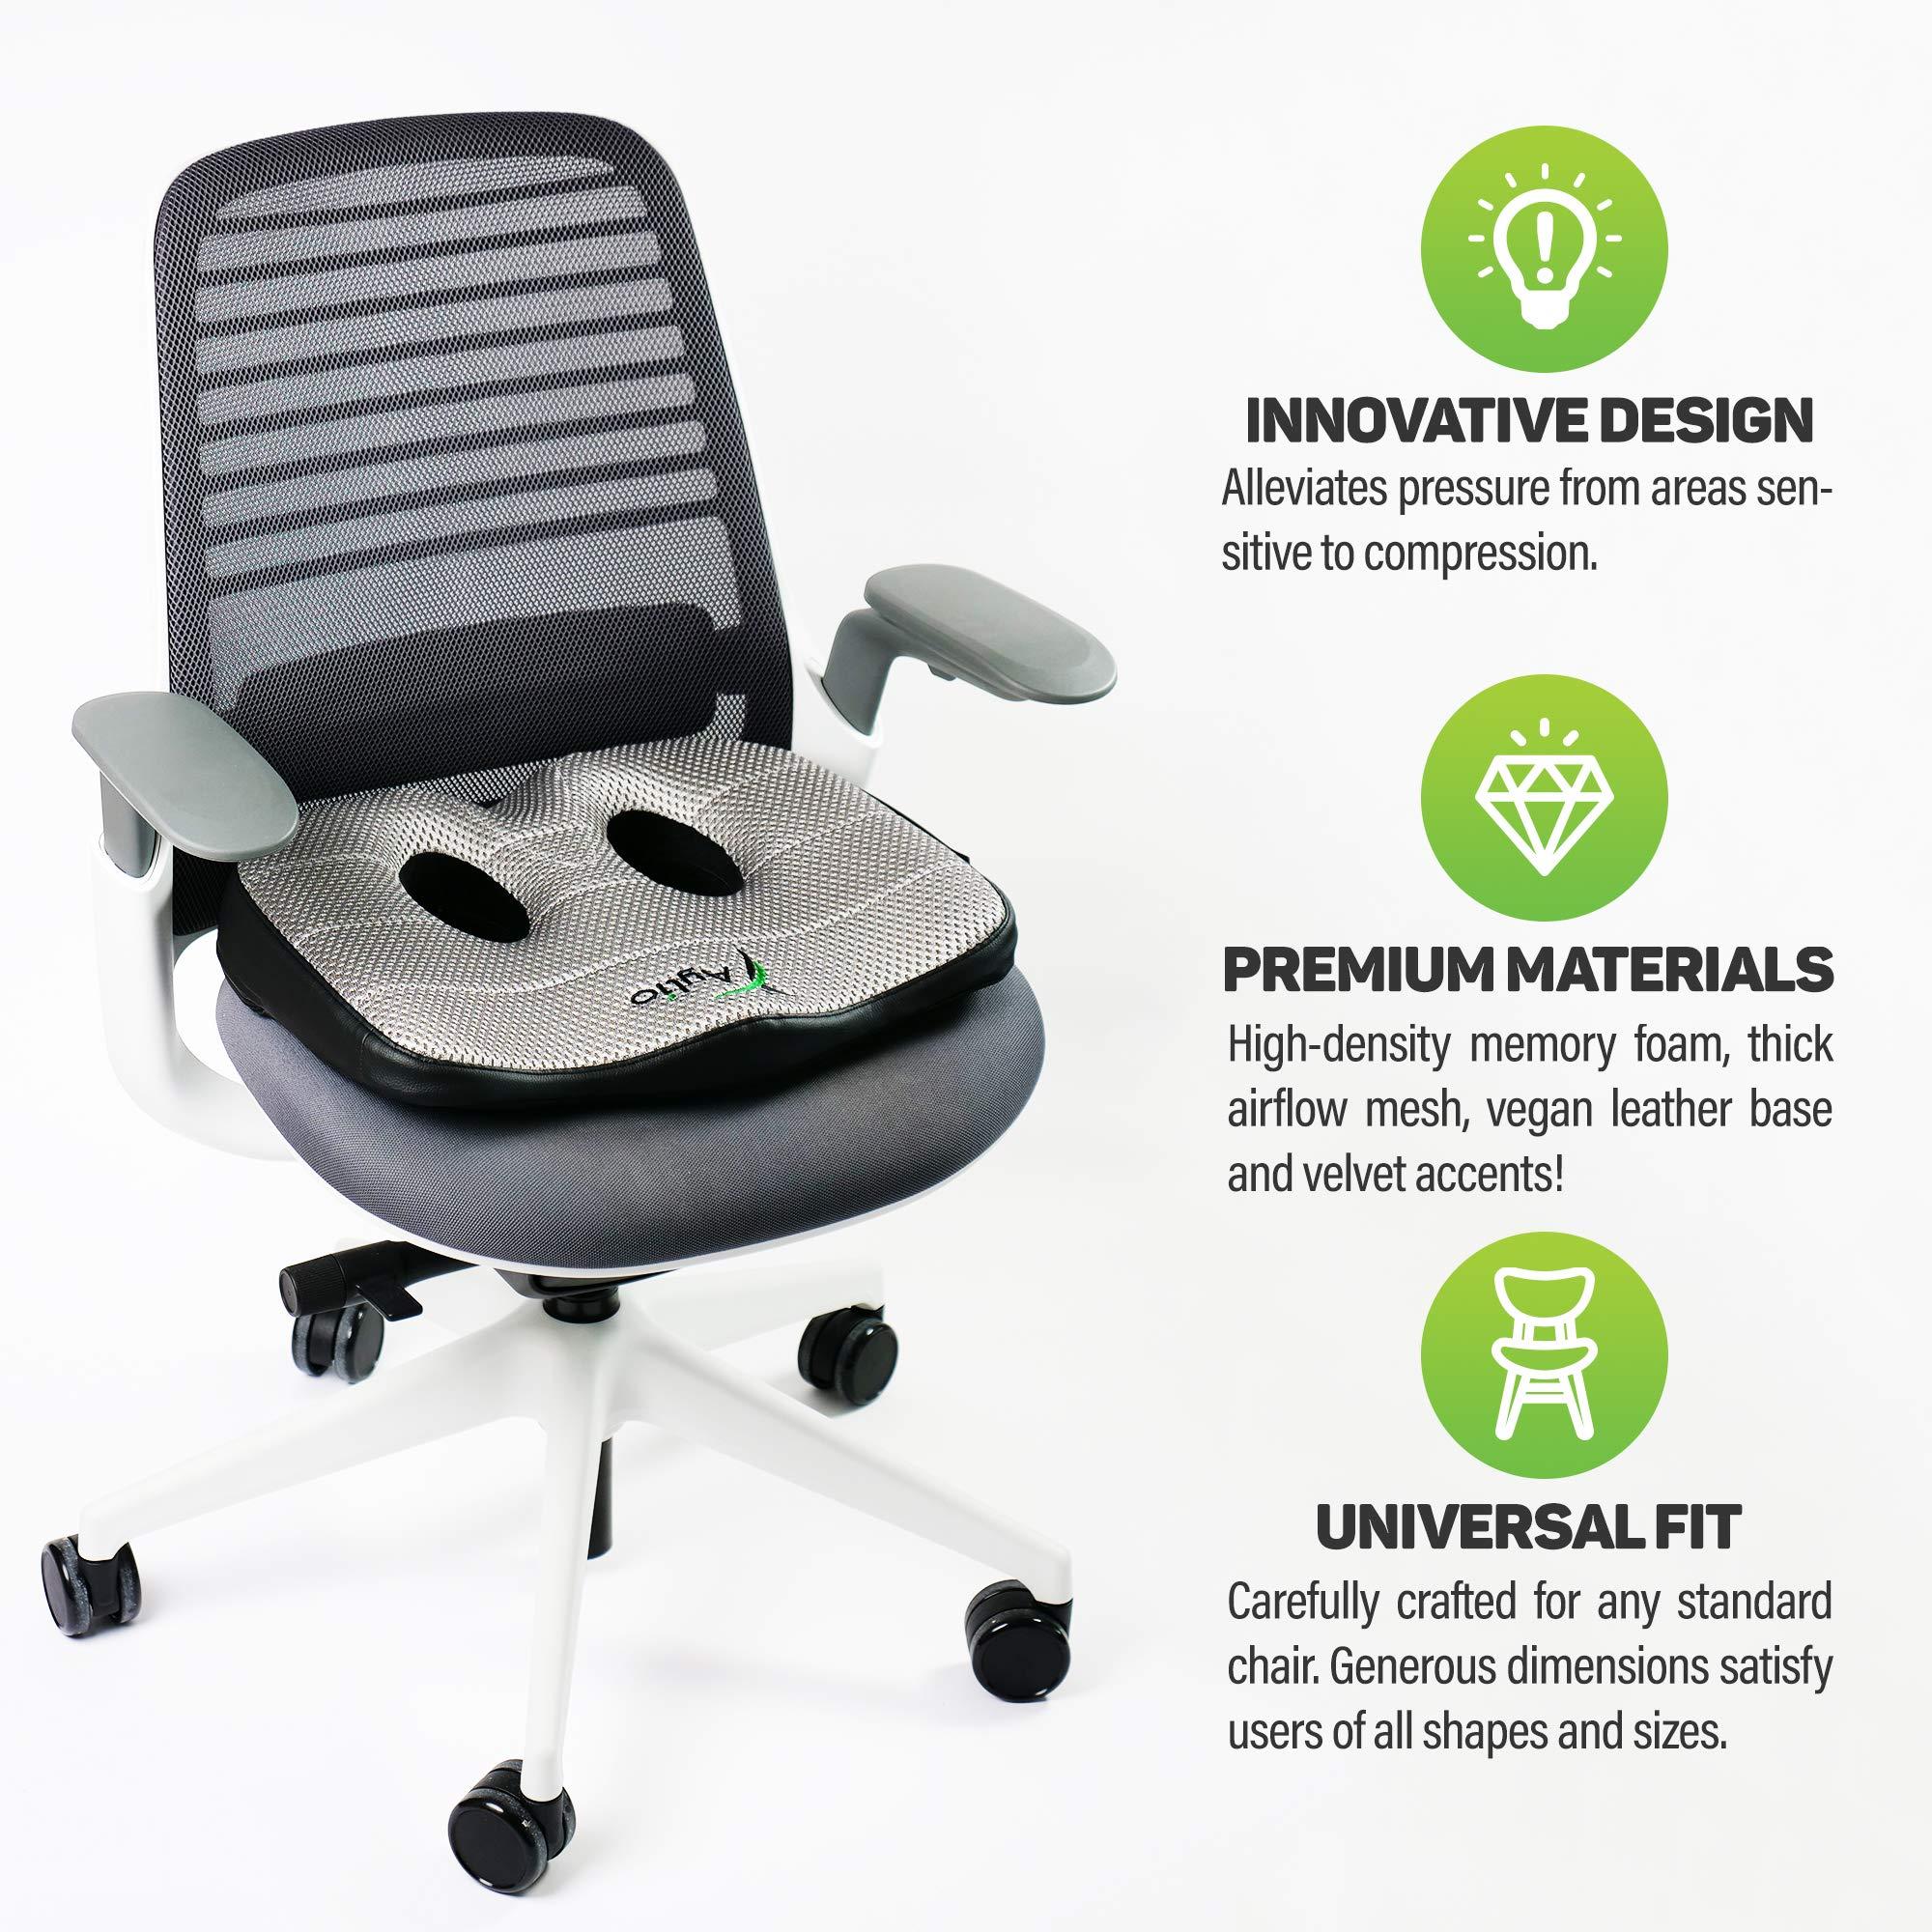 Socket Seat Memory Foam Sit Bone Relief Cushion For Butt Lower Back Hamstrings Hips Ischial Tuberosity